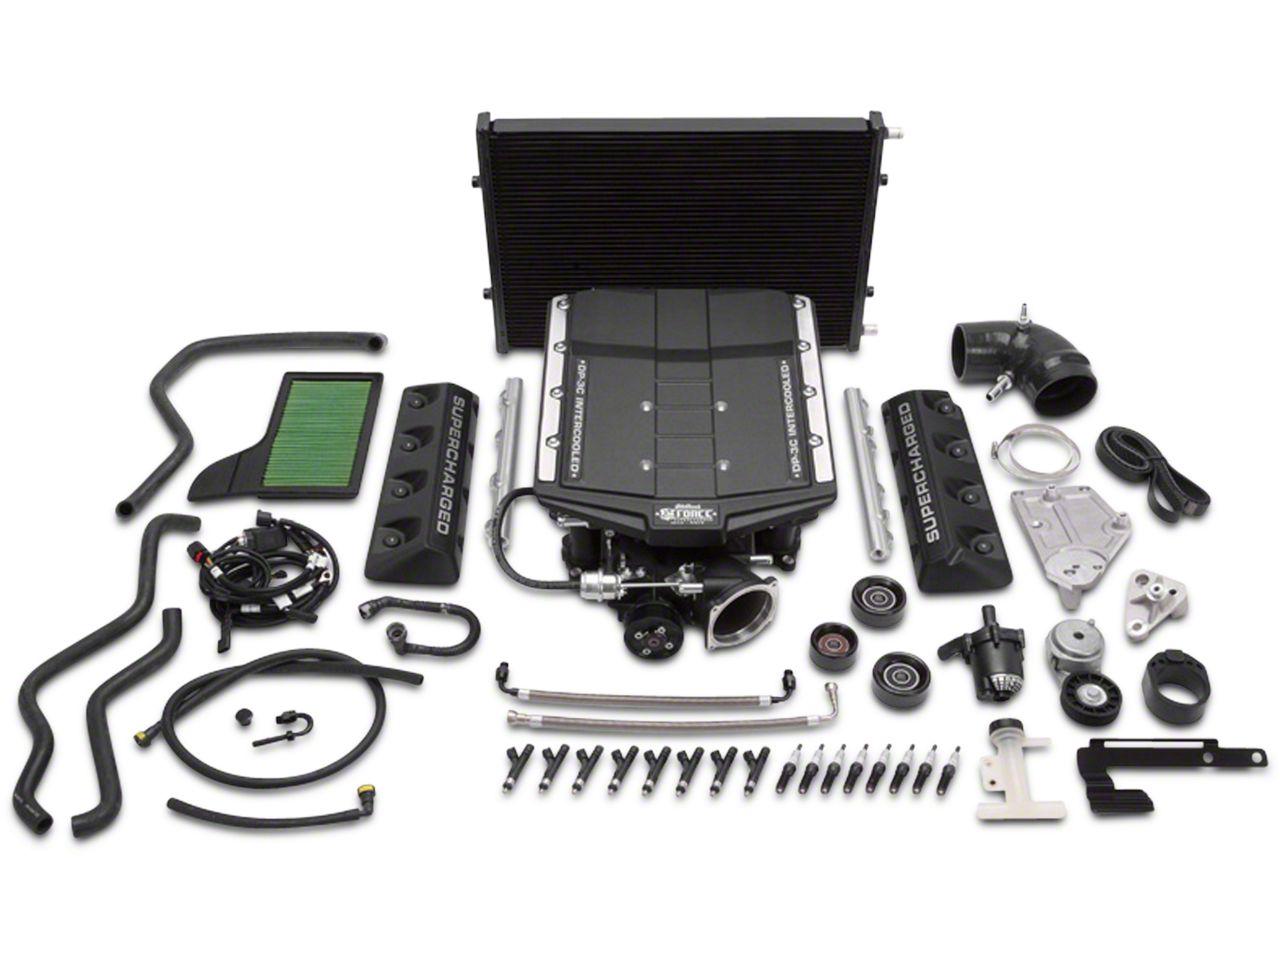 Edelbrock E-Force Stage 1 Street Supercharger Kit w/o Tuner (15-17 GT)